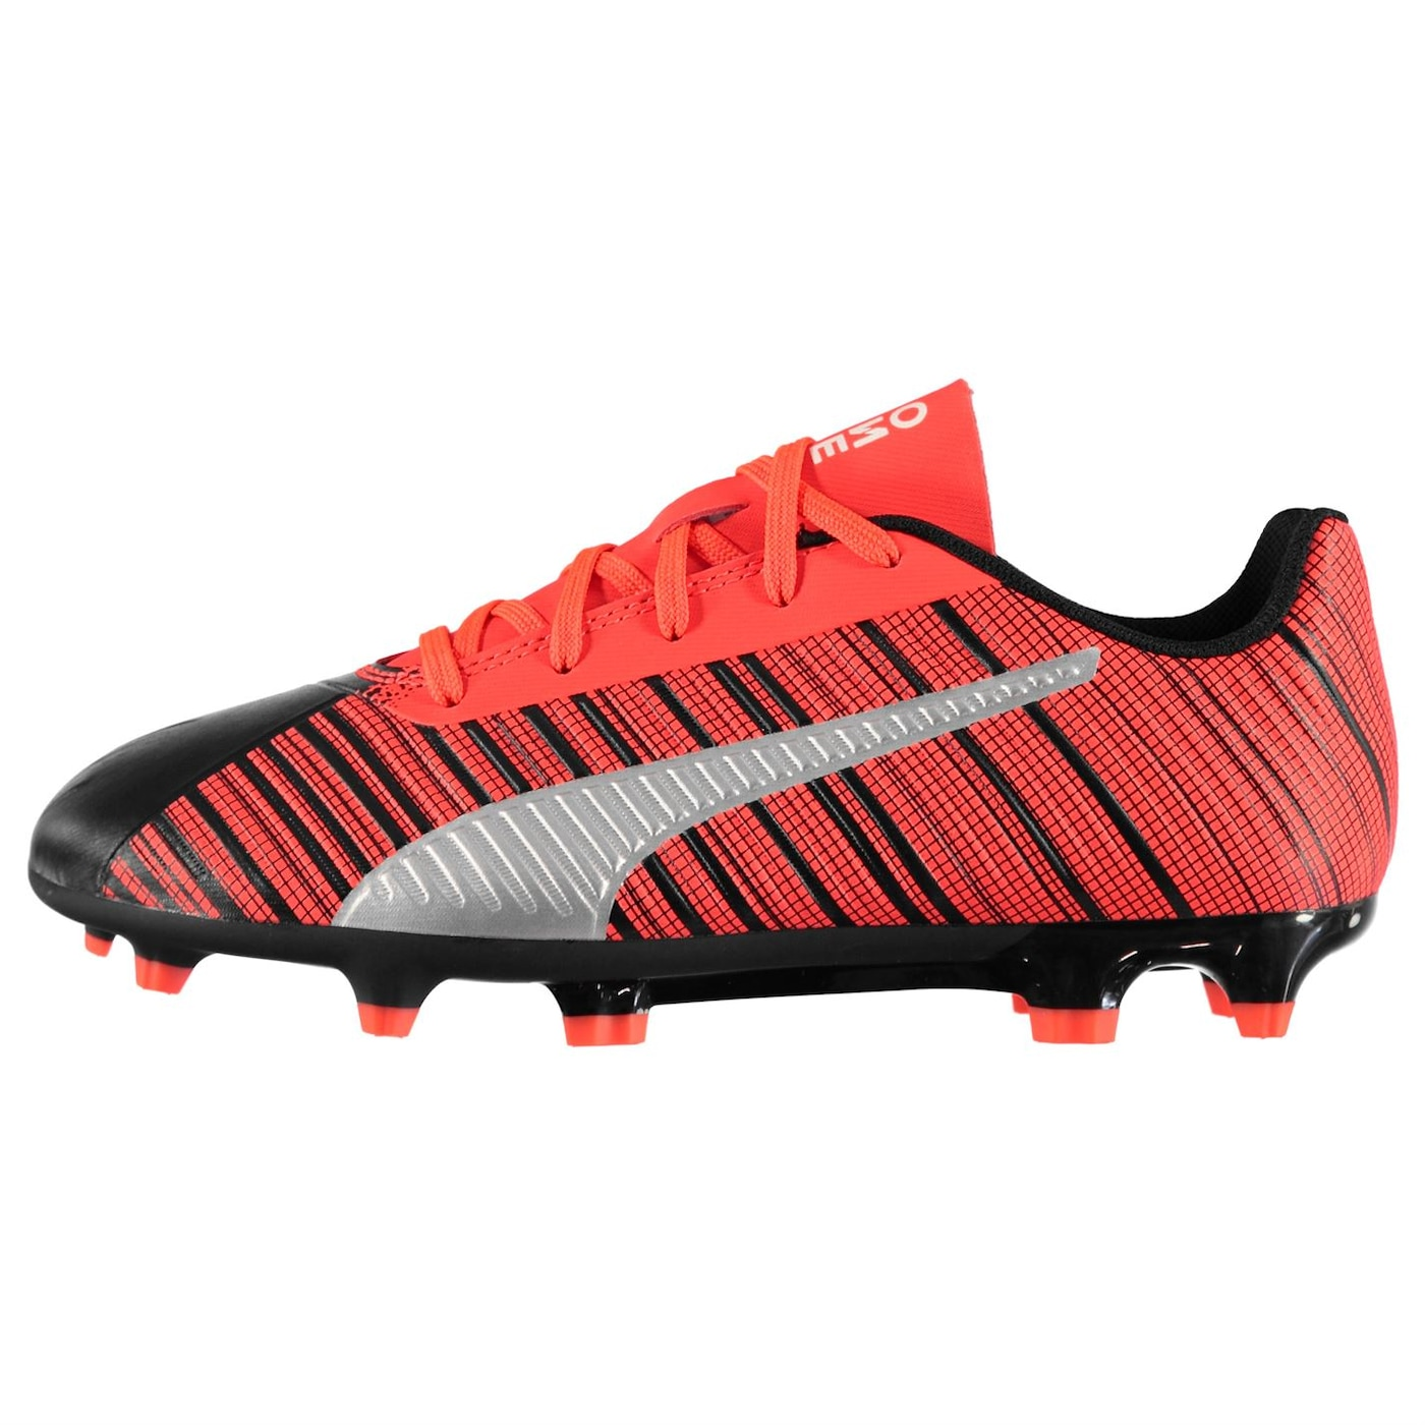 Puma One 5.4 Junior FG Football Boots